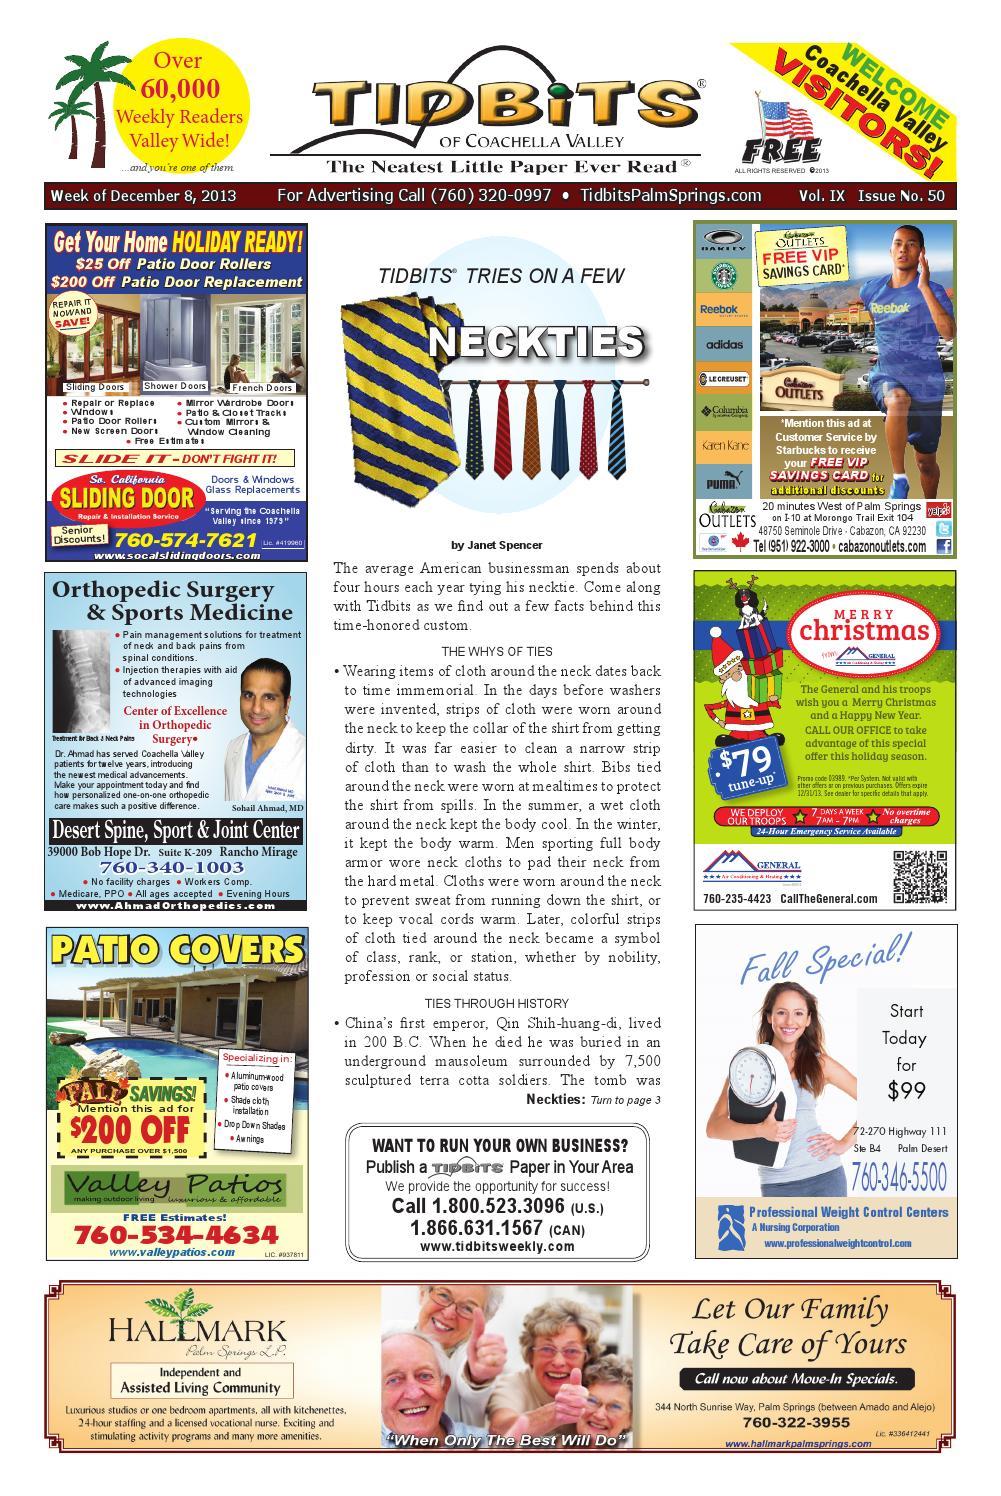 dc7afd7c24f Vol. 9: #50 • Neckties • (12/8/13) Tidbits of Coachella Valley by ...